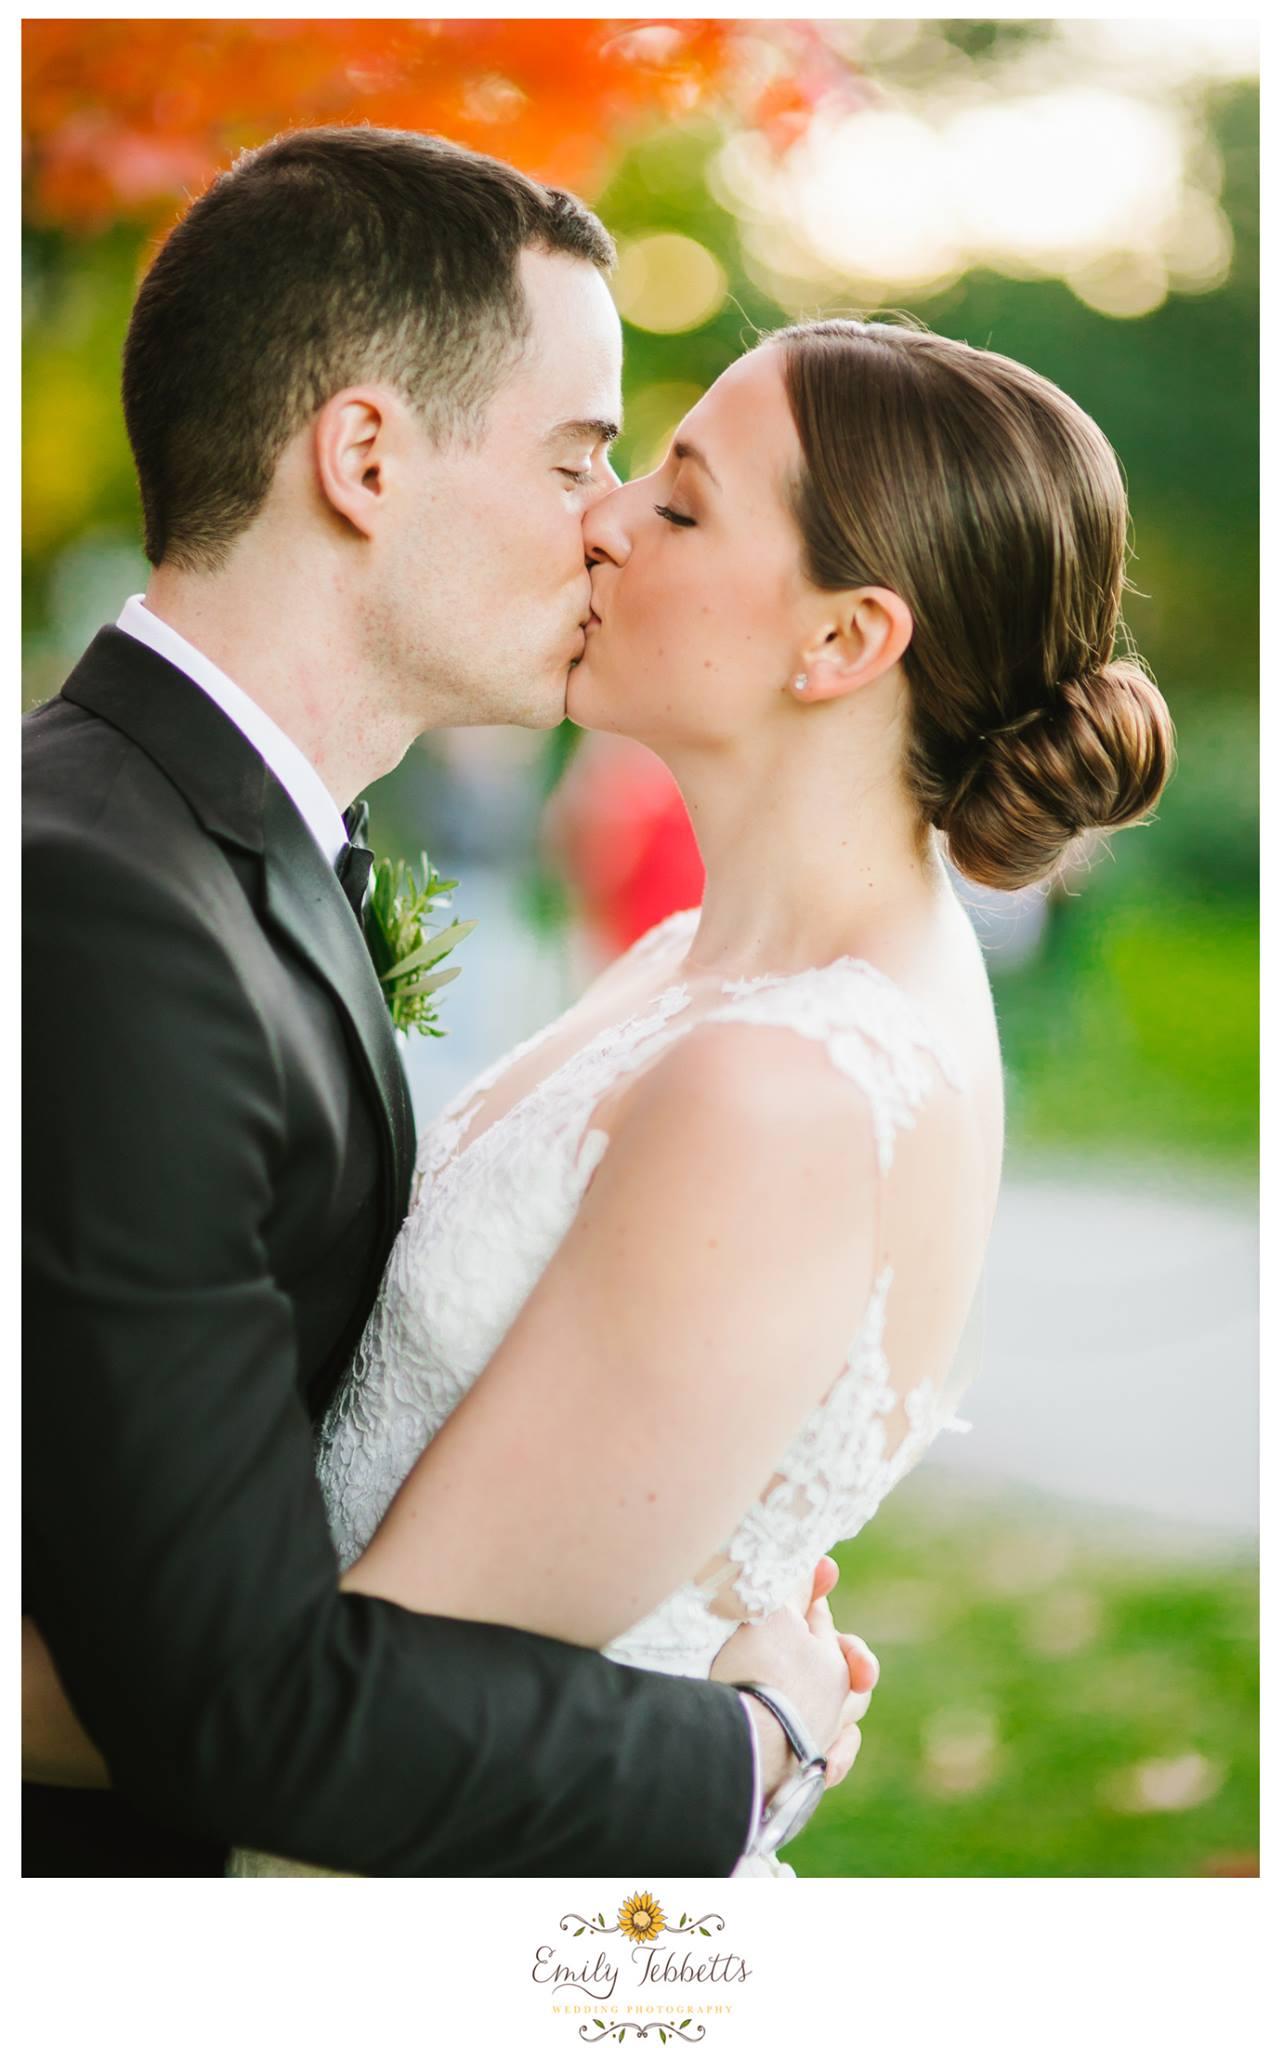 Boston, MA - Emily Tebbetts Wedding Photography 4.jpg